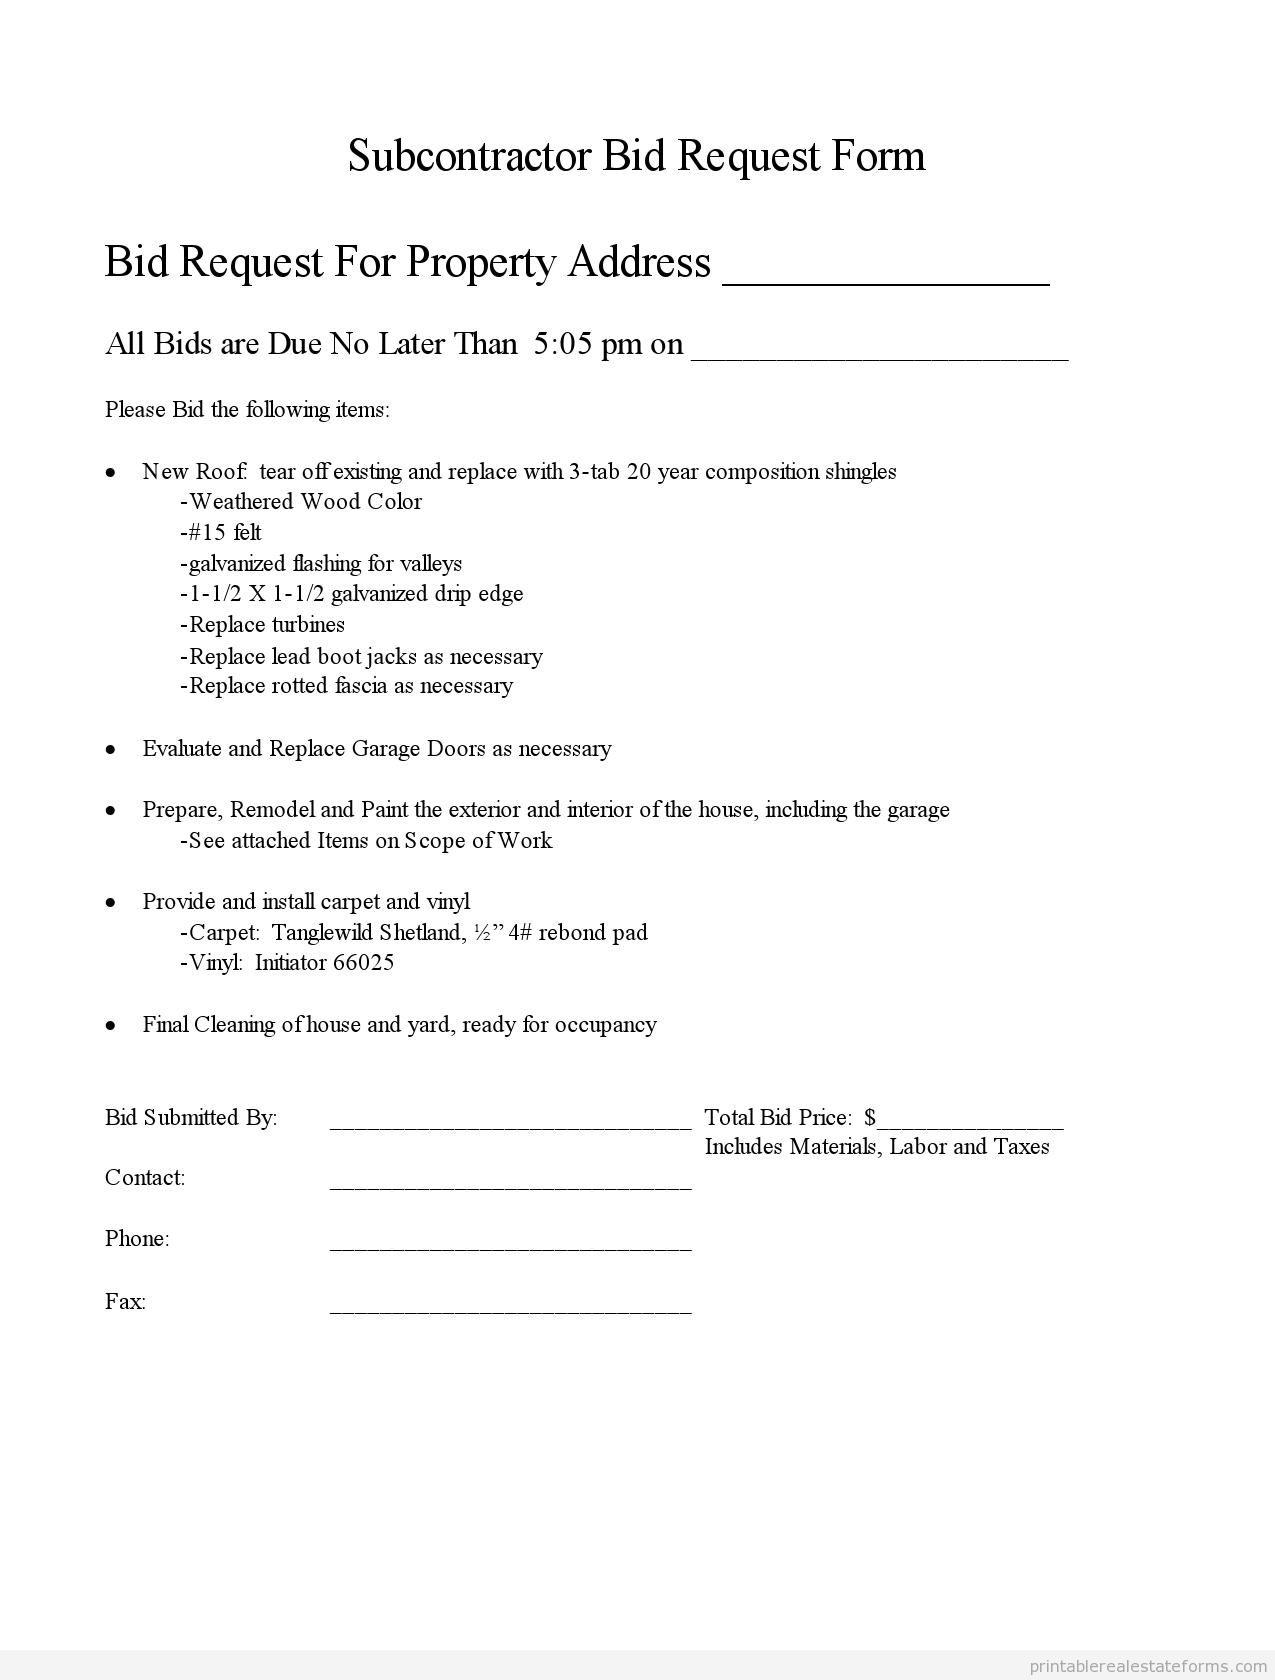 Free Subcontractor Bid Forms Get Generic Templates